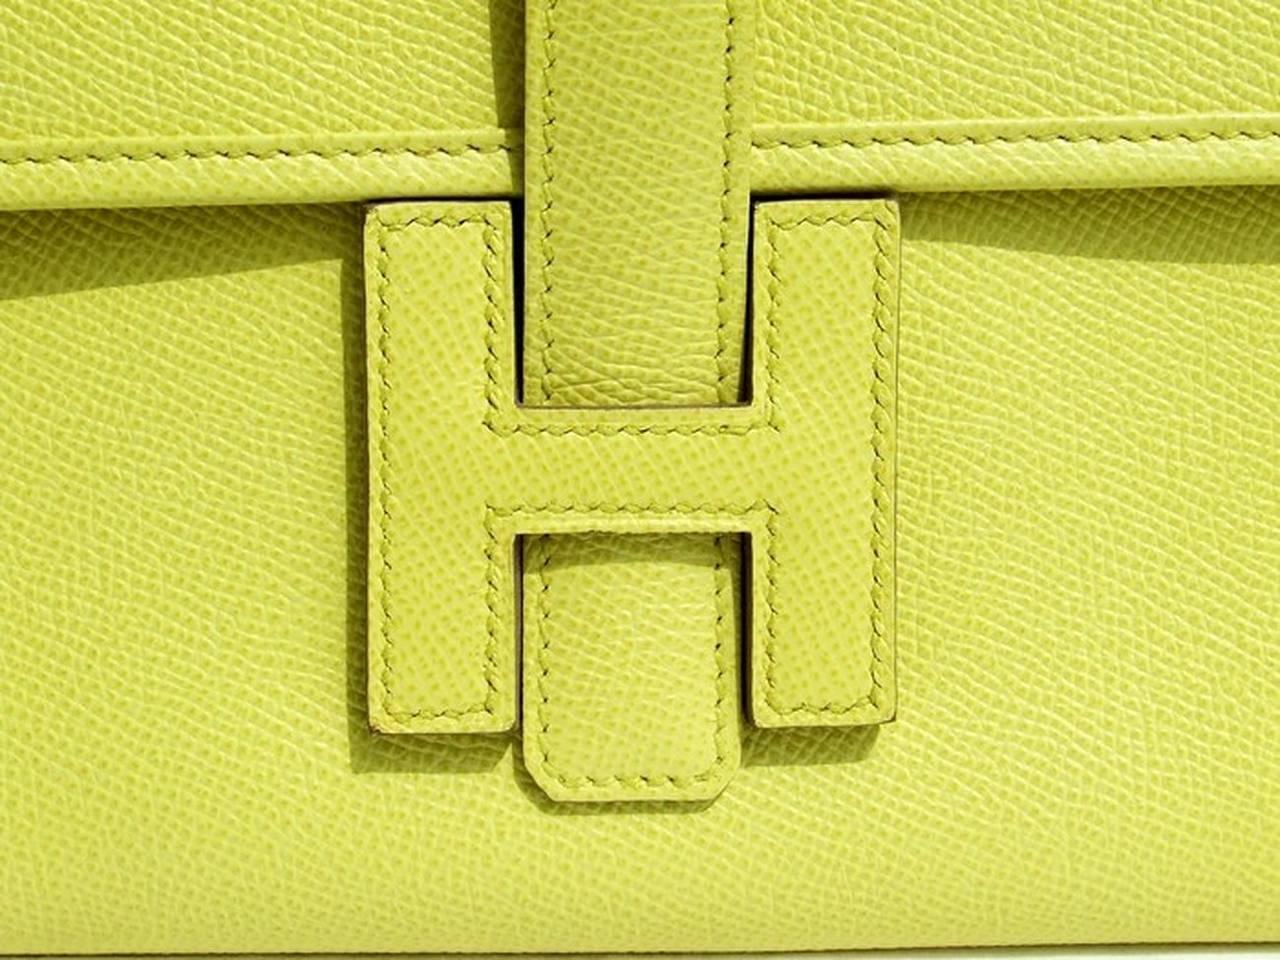 Authentic Hermes Jige Elan H Clutch Bag Soufre Epsom Leather 29 cm ...